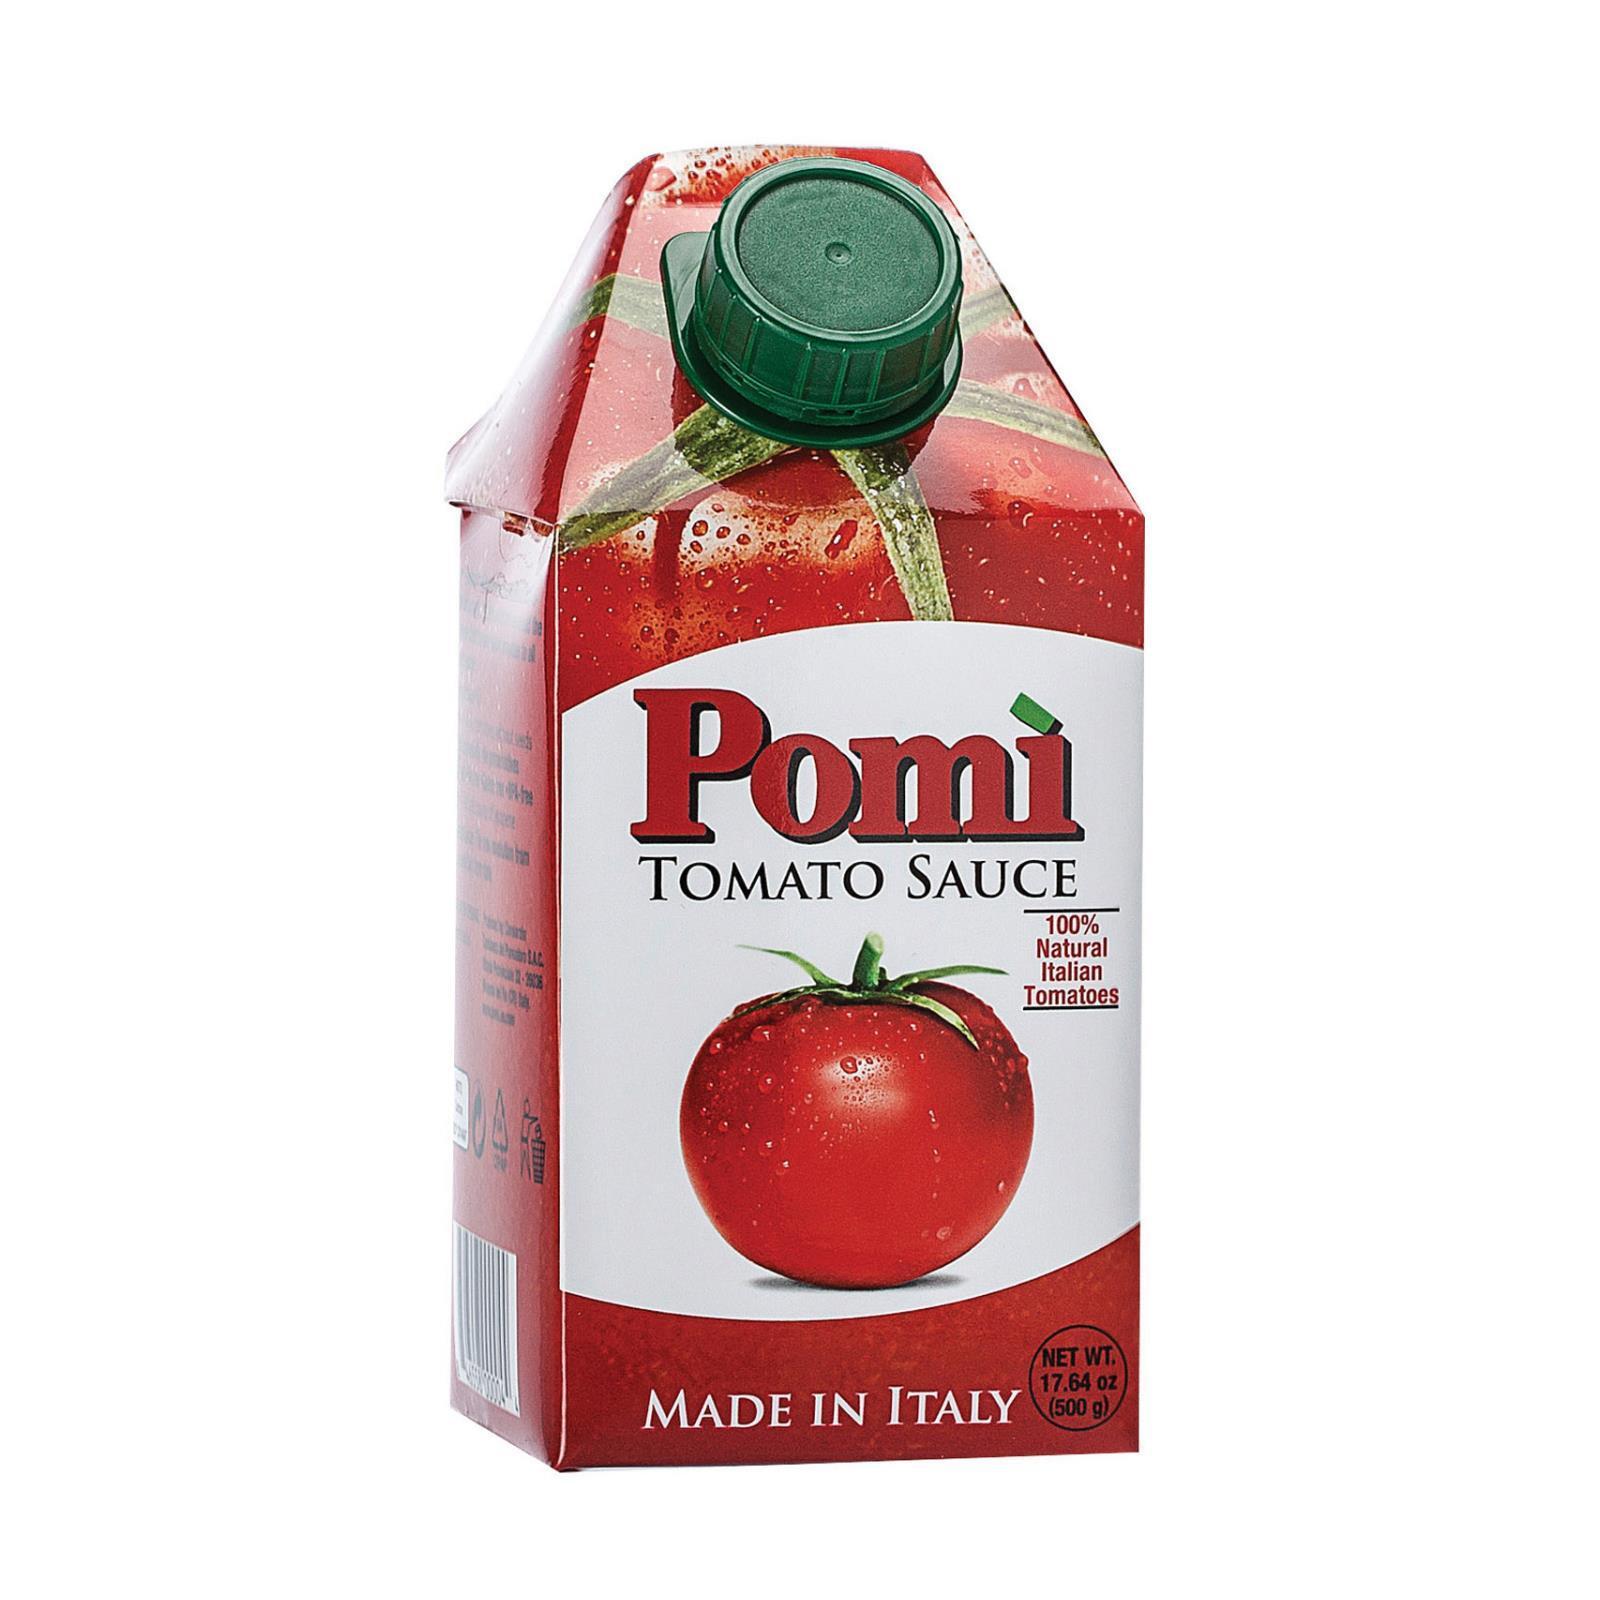 Pomi Tomatoes Tomato Sauce - Case of 12 - 17.64 Fl oz.